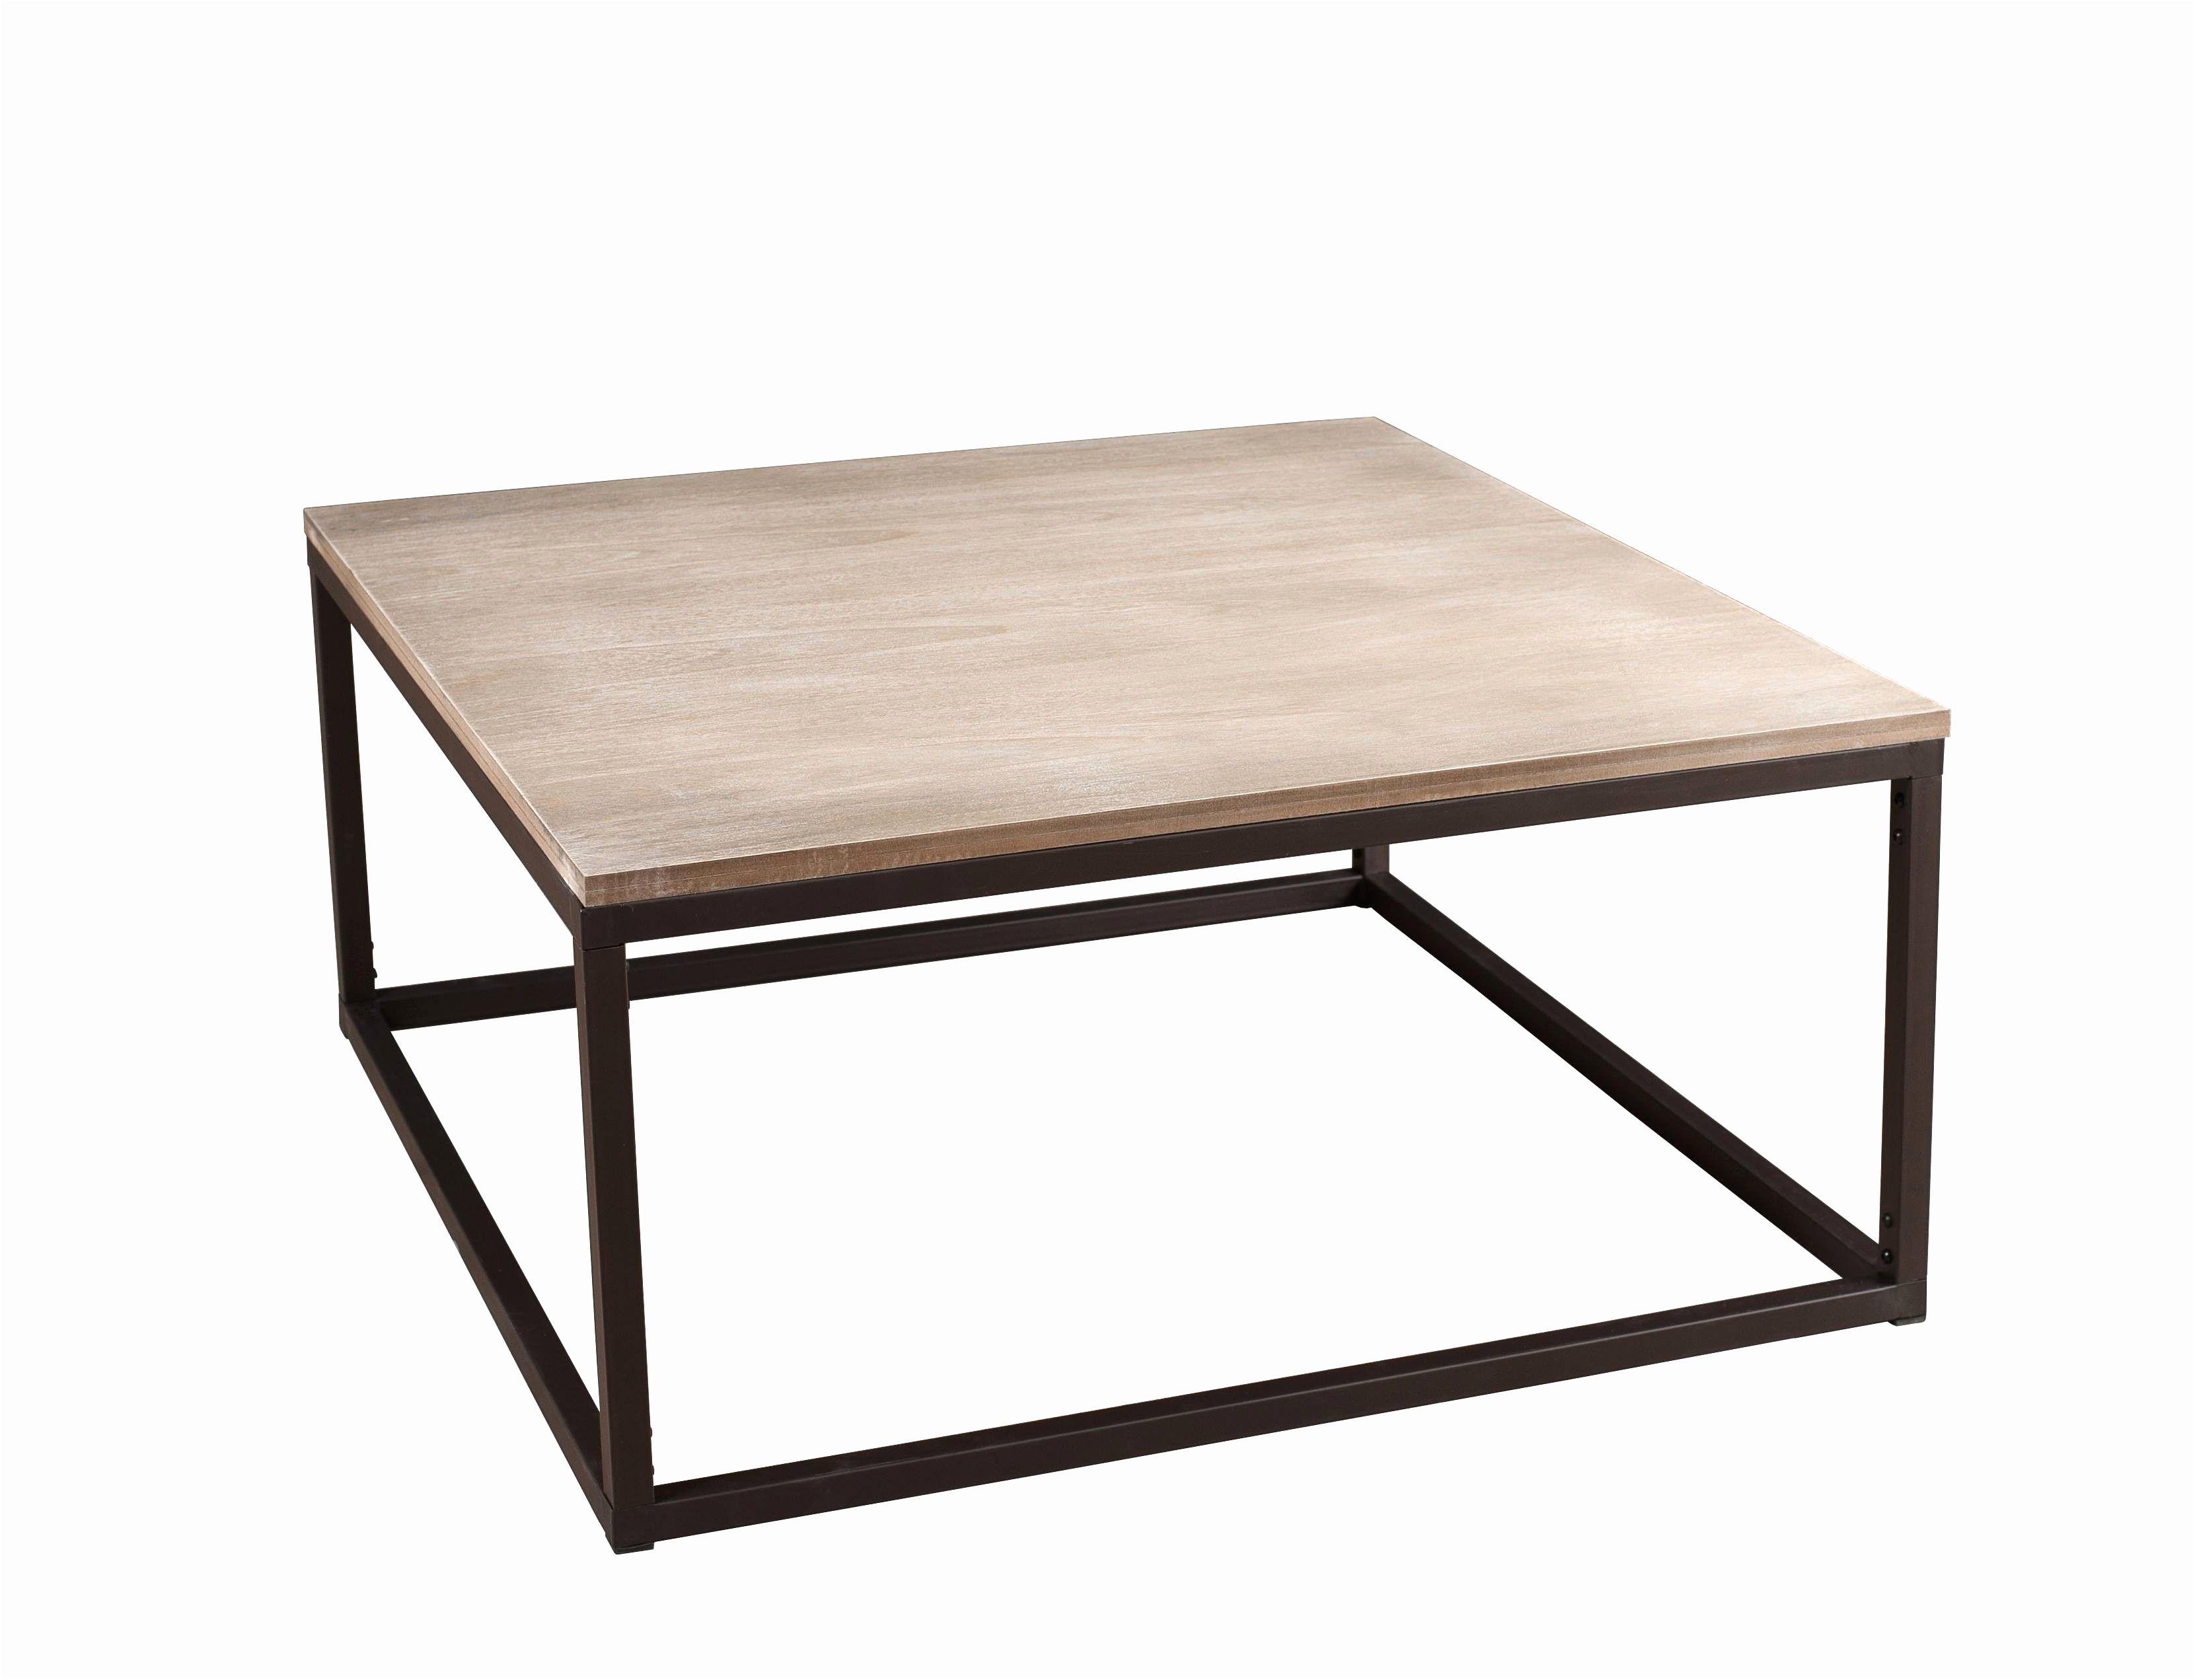 13 Pascher Table Basse Relevable Alinea Photograph